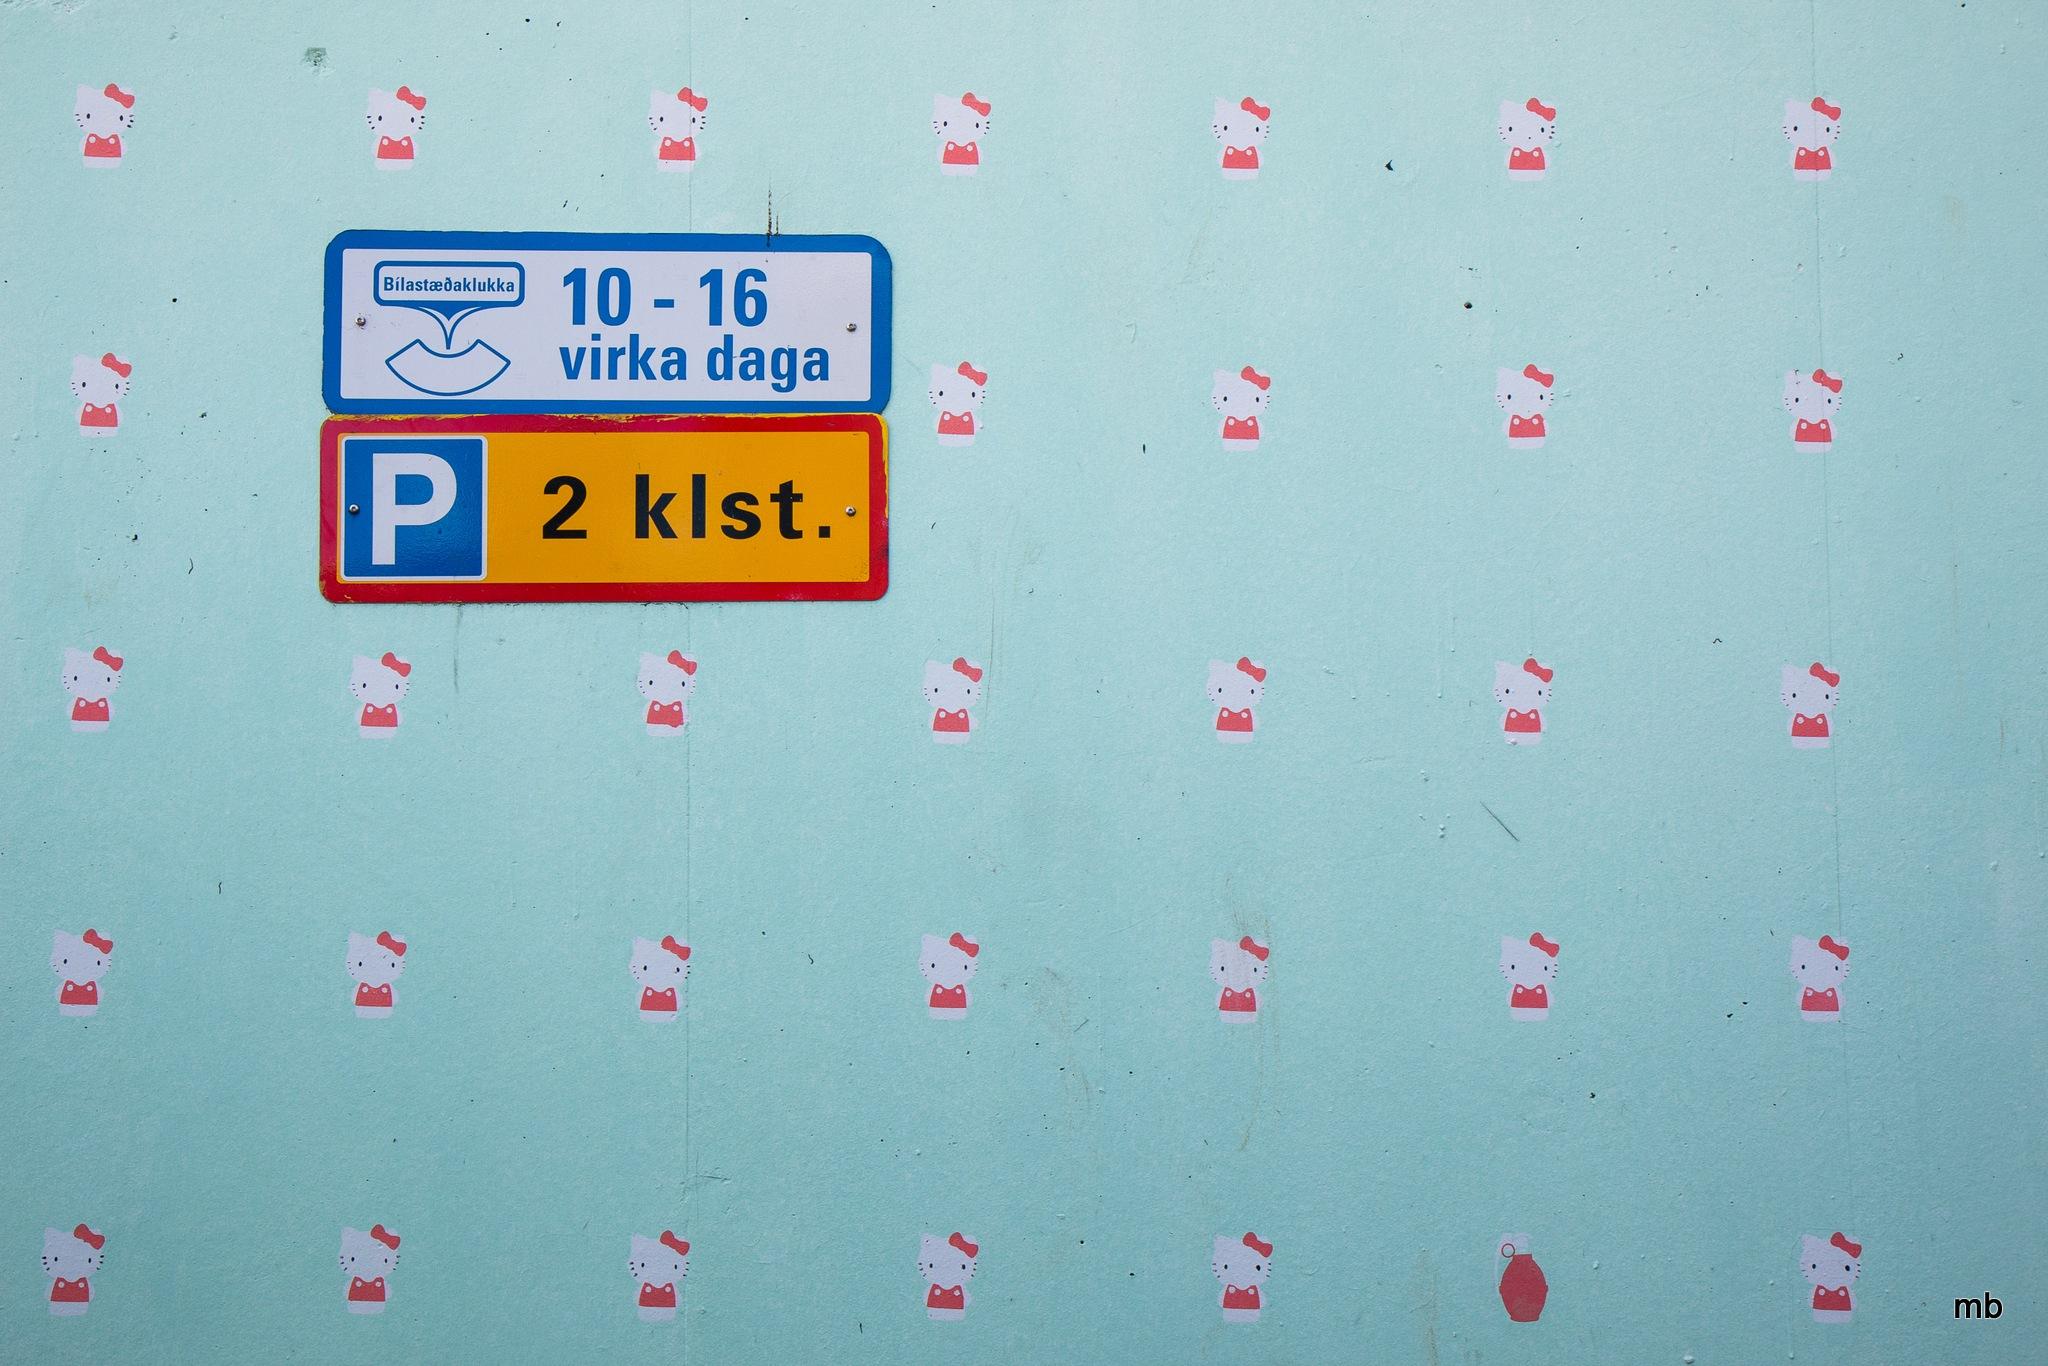 Parking and Grenade by magnusbjorns